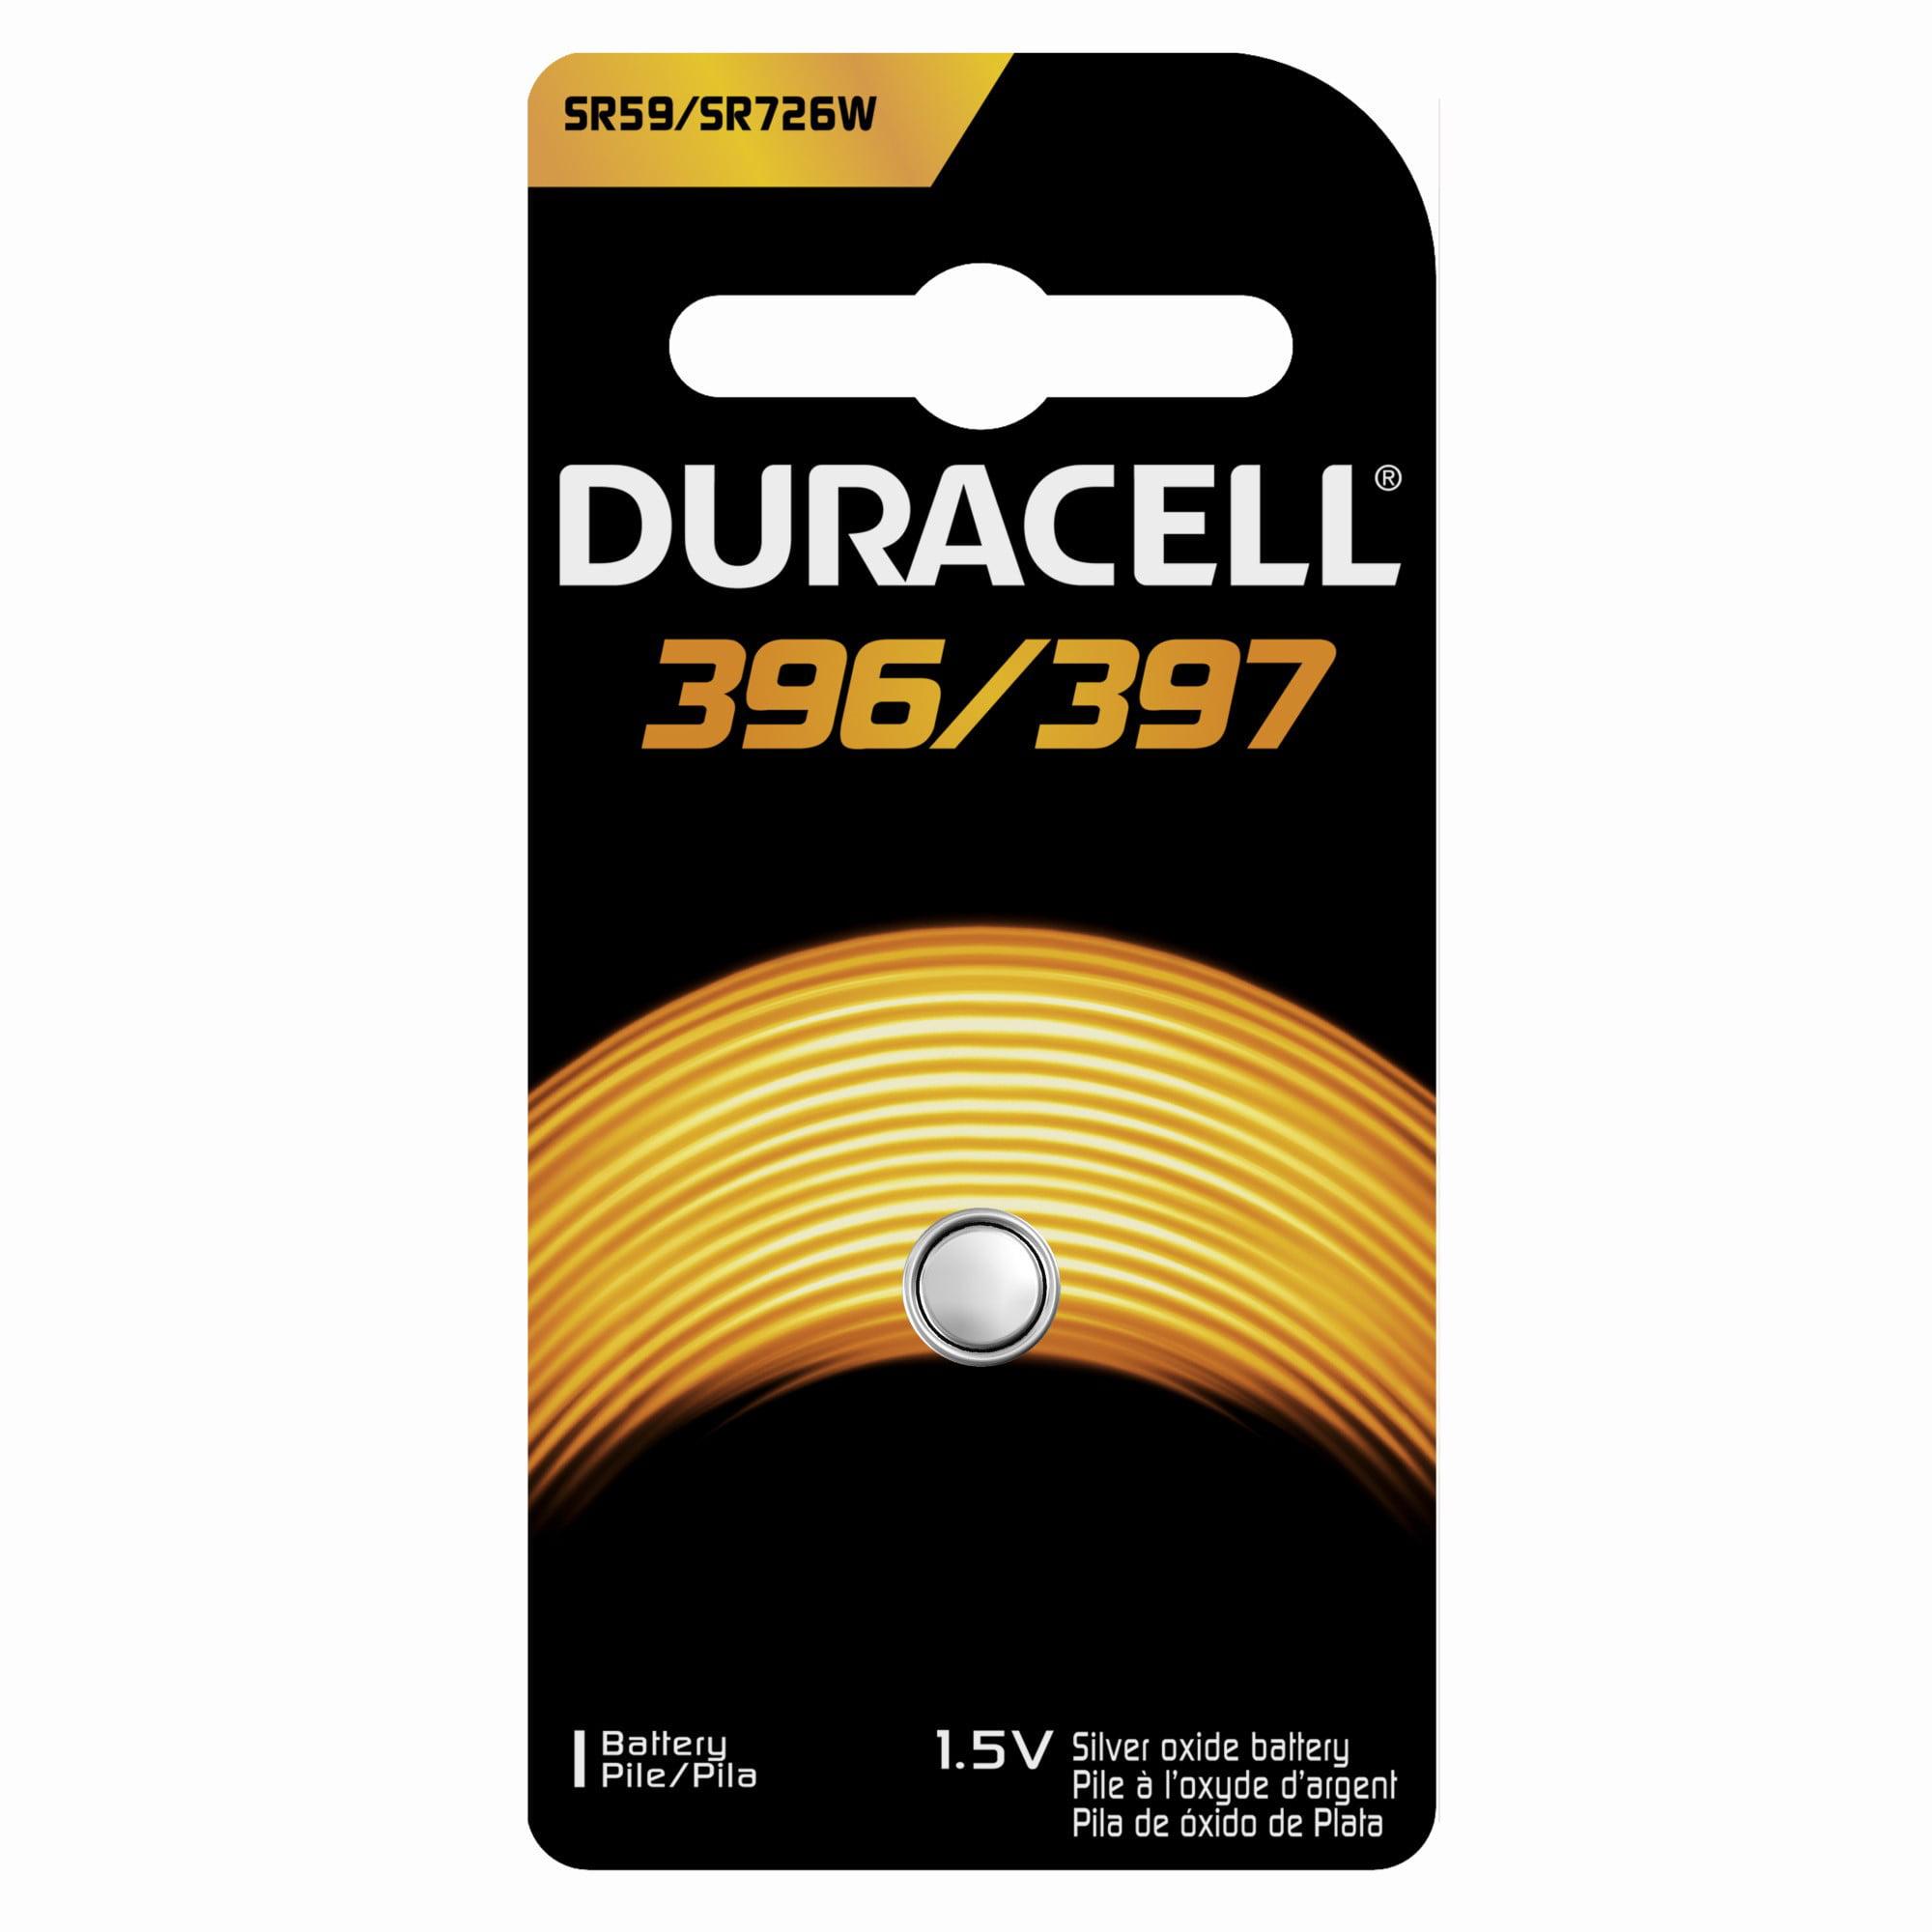 Duracell Silver Oxide Button 396/397